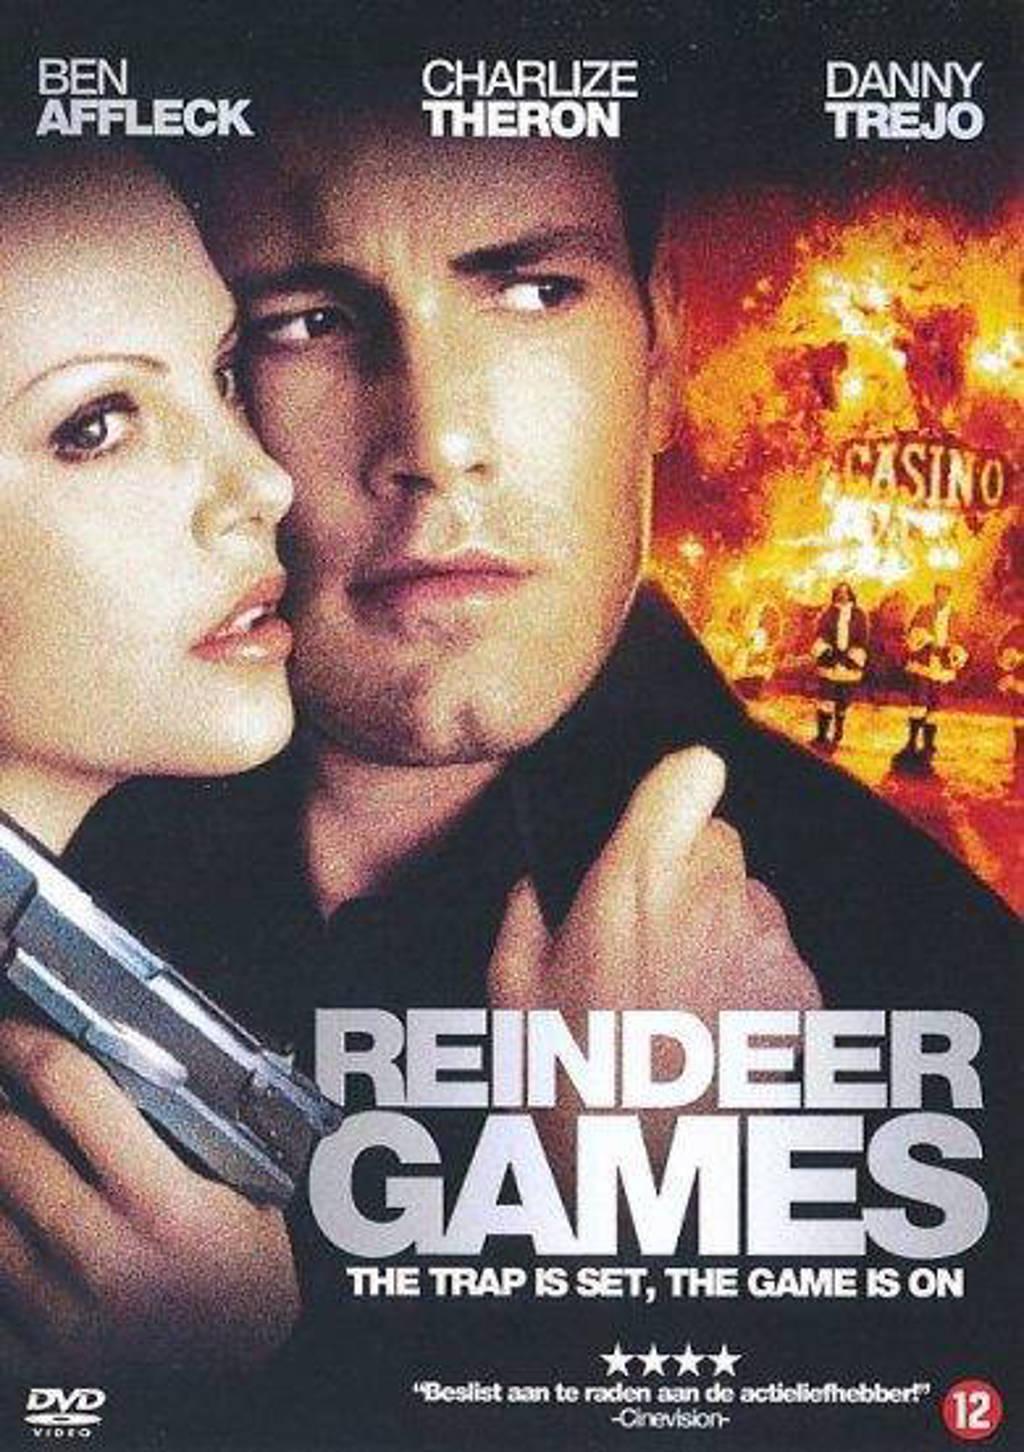 Reindeer games (DVD)